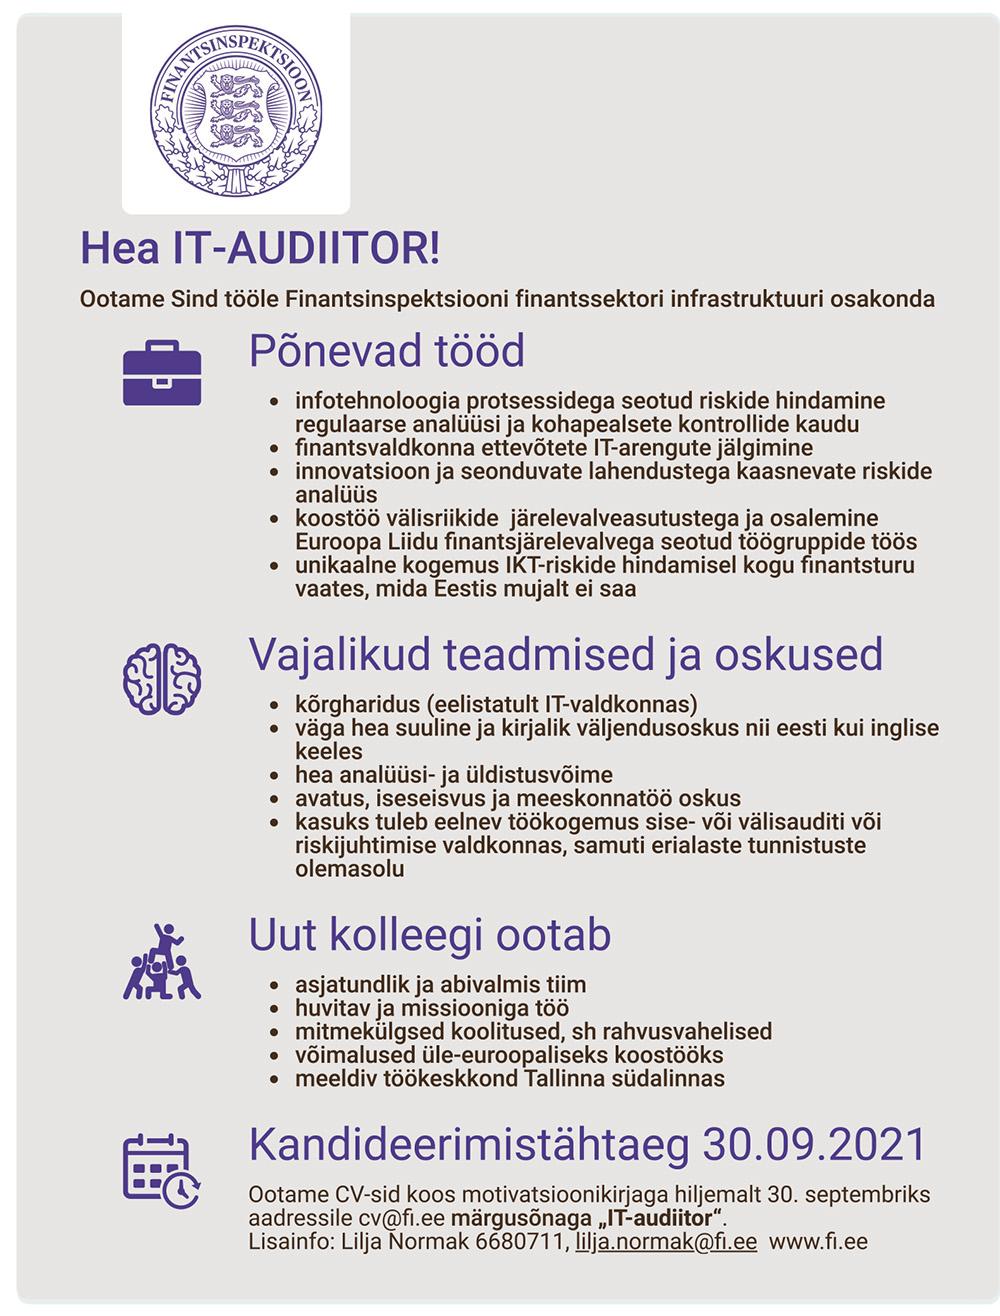 IT-AUDIITOR